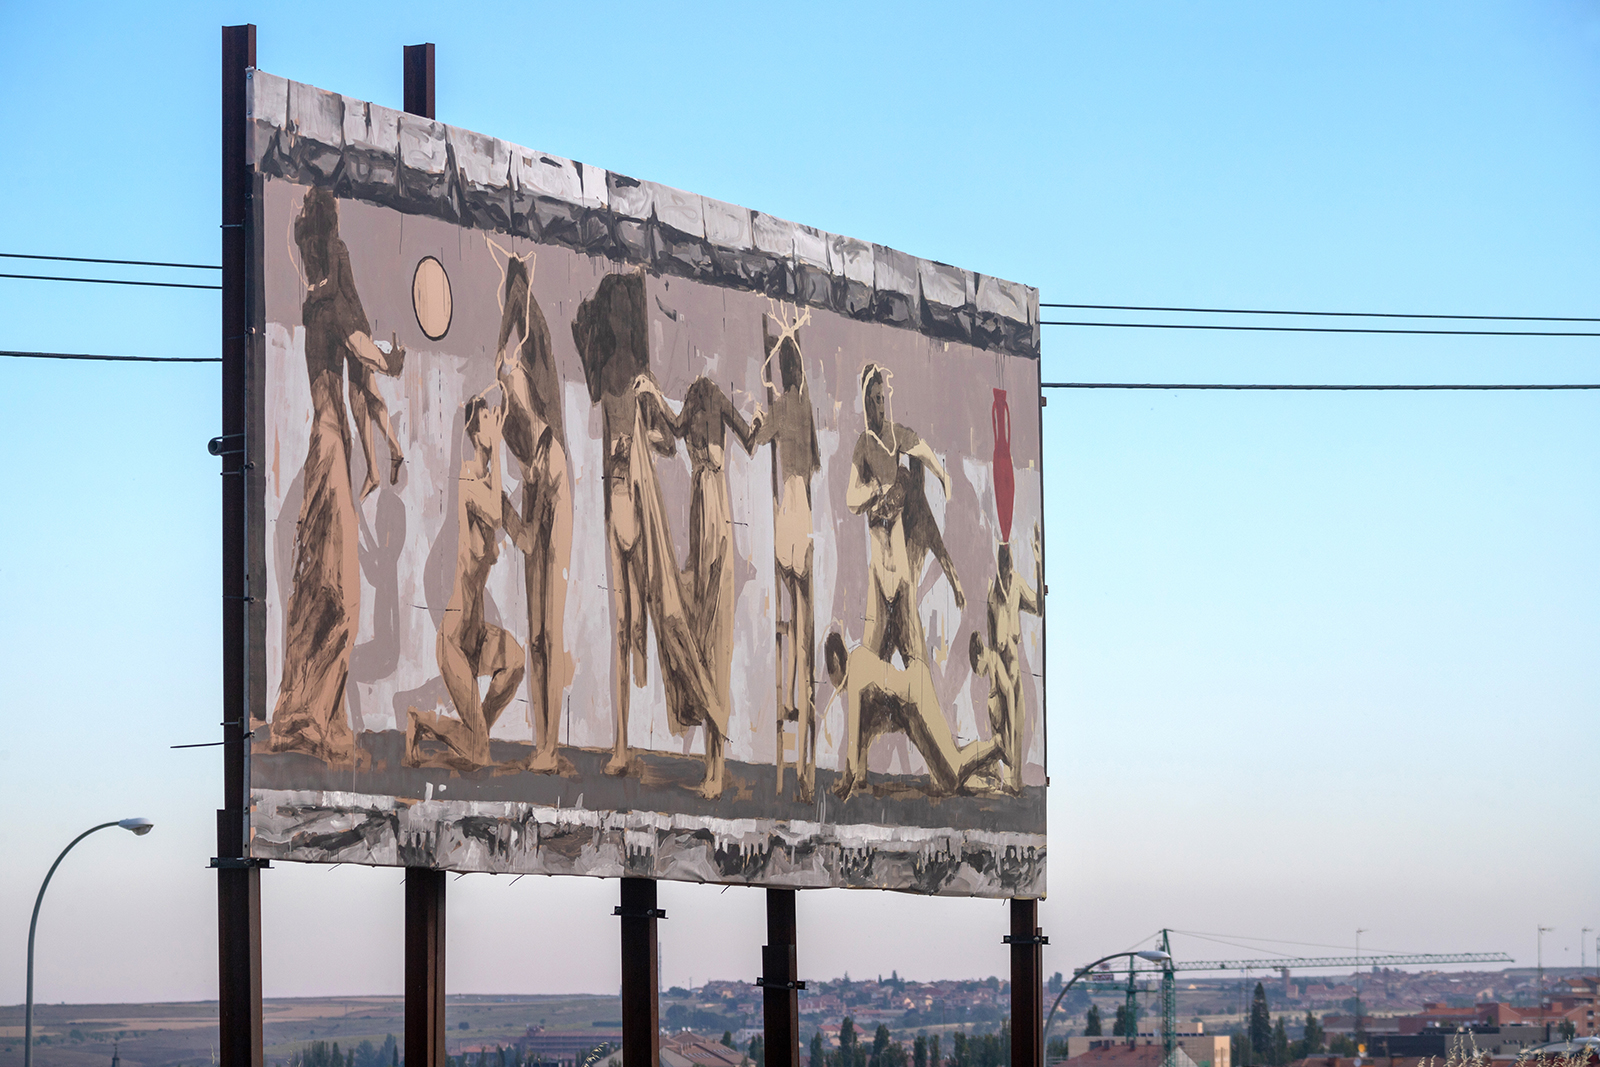 Insurrecta de Gonzalo Borondo, em Segóvia Artes & contextos 14 Insurrecta Borondo photo Roberto Conte IX